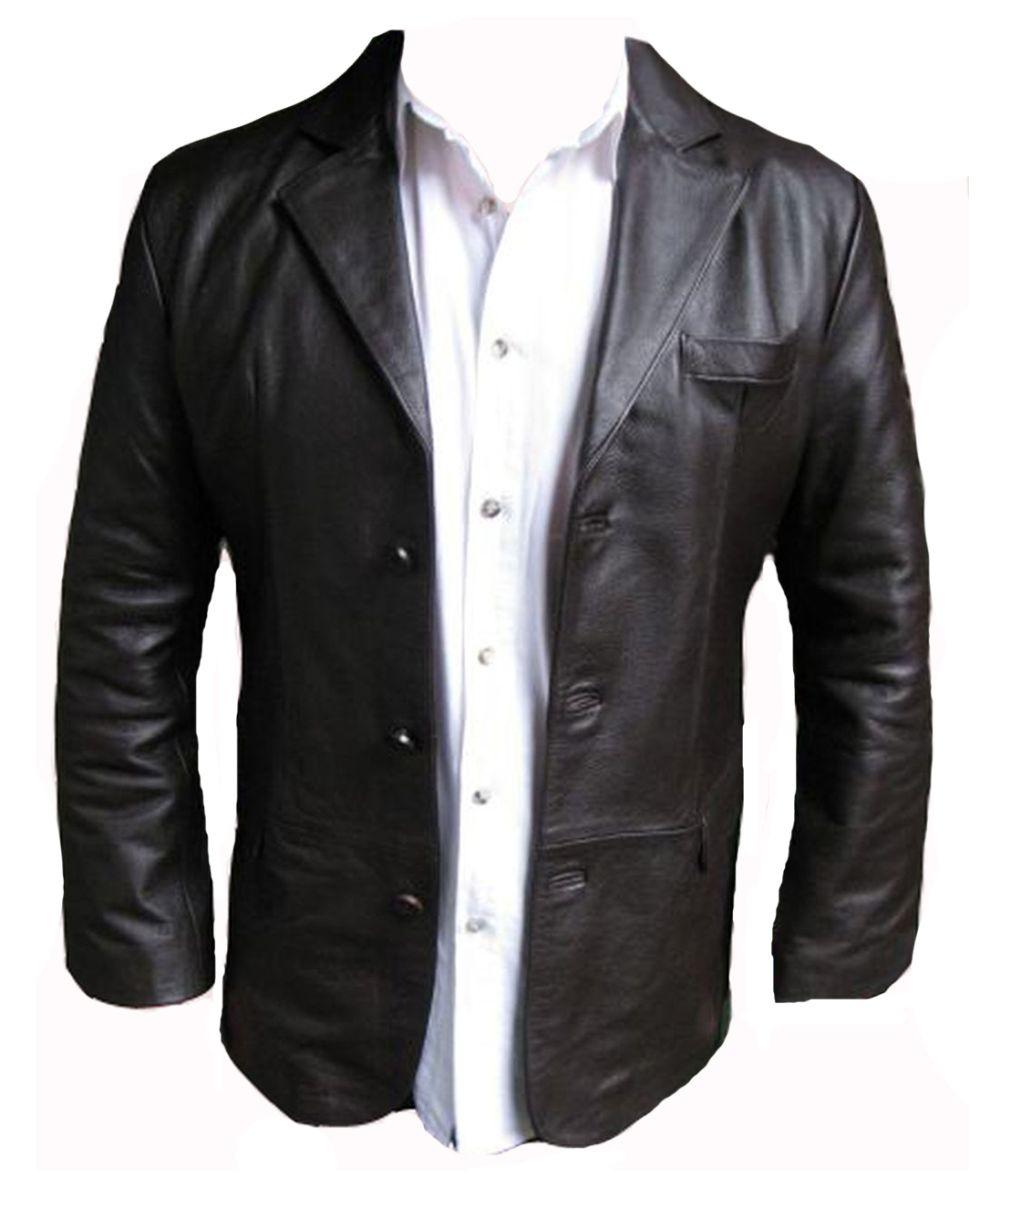 Veste hommes cuir veste de costume blazer marron m l xl xxl 6 xl ebay - Blazer homme marron ...